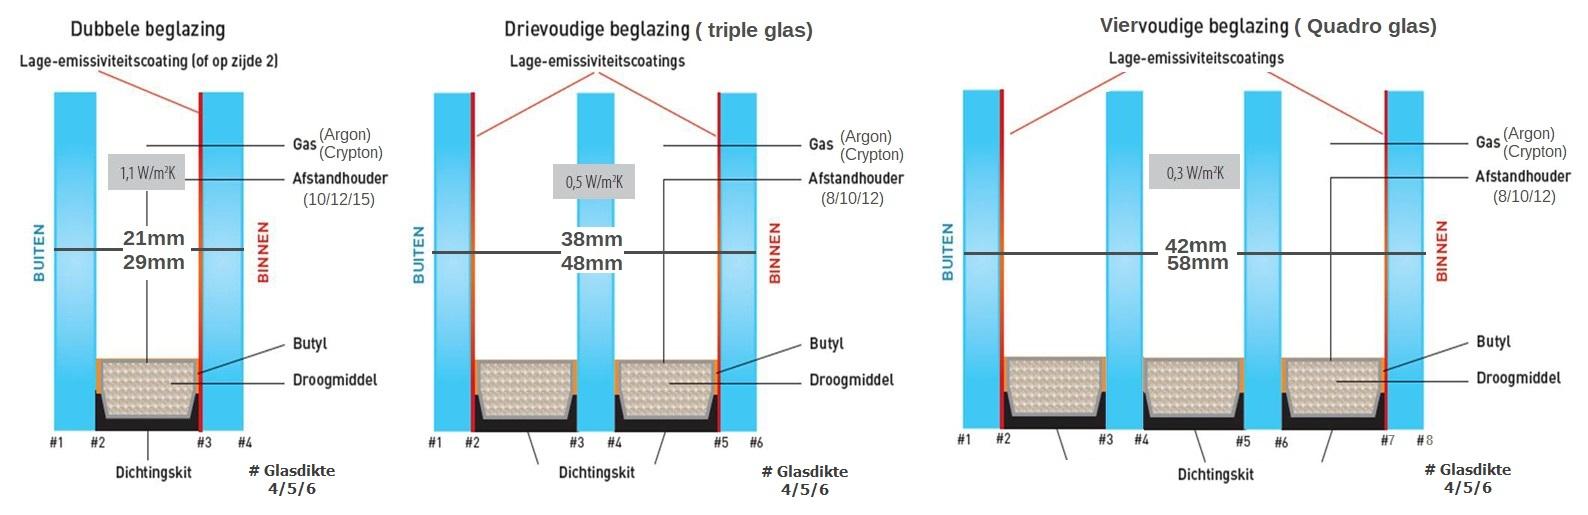 triple glas quadro glas dubbel glas, twee voudig glas, drie voudig glas, vier voudig glas, HR glas, hr++ hr+++ hr++++ glas, isolatie glas